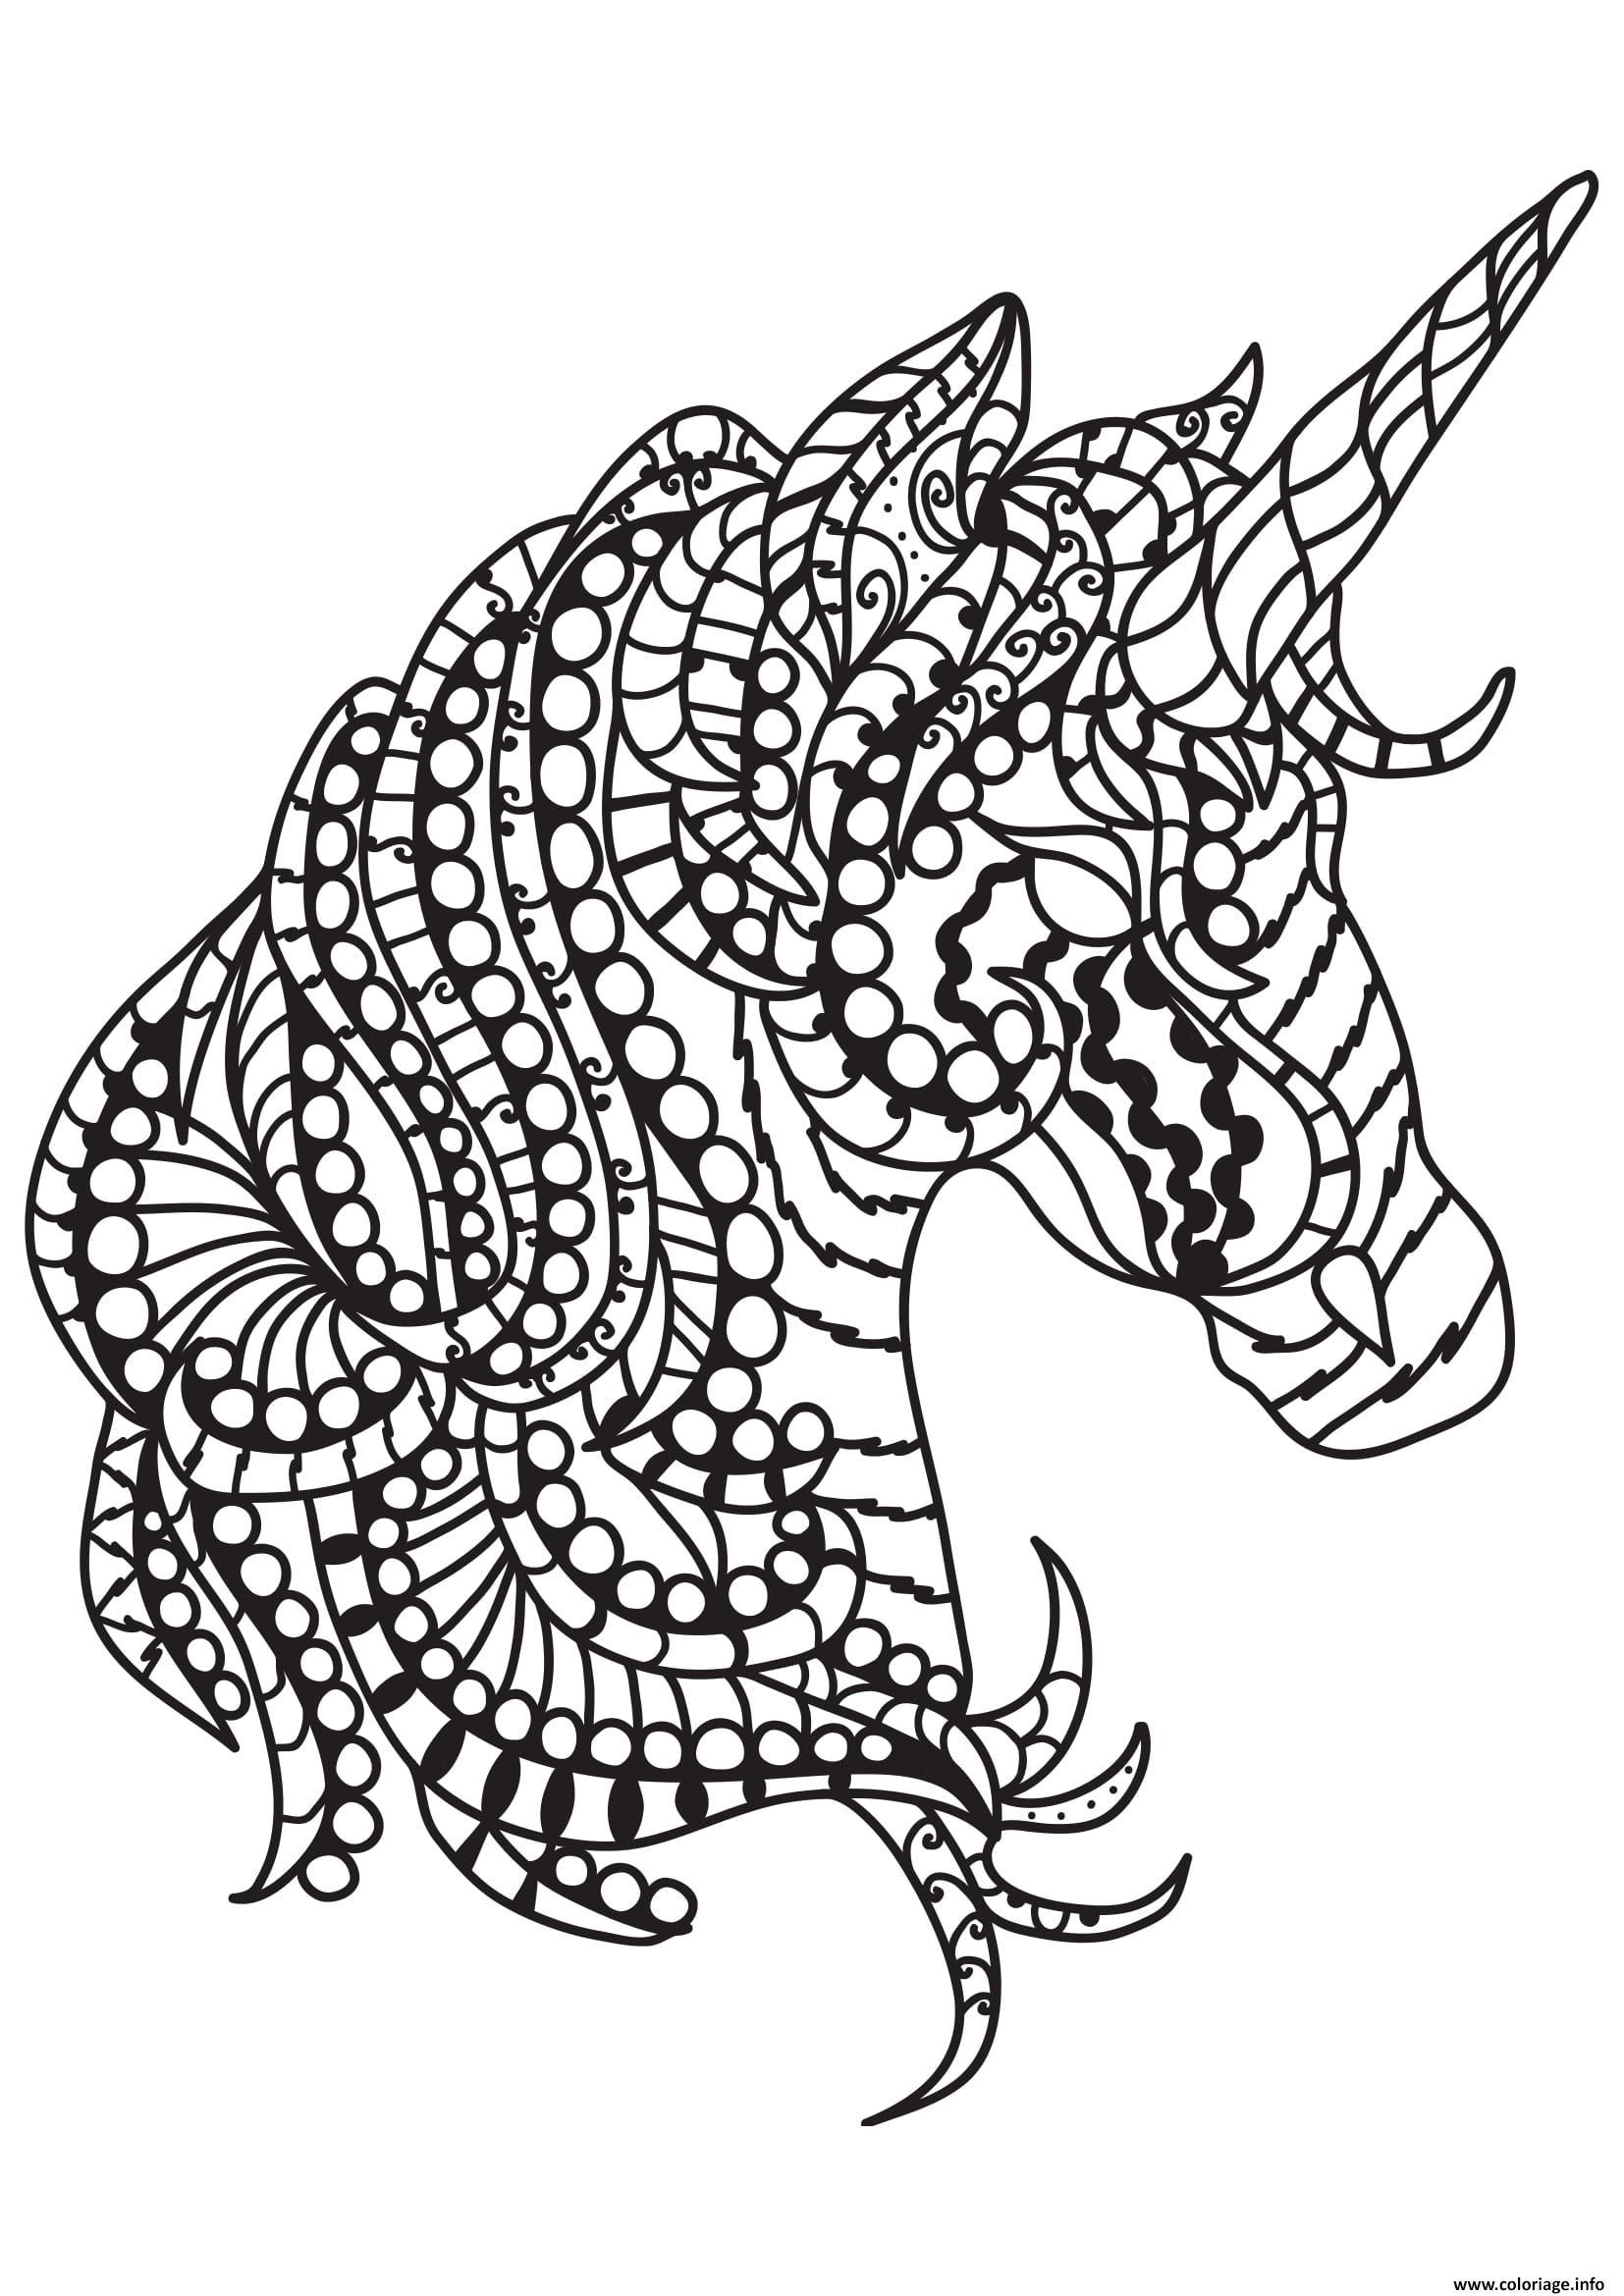 Coloriage Cheval Cheval Motifs Zentangle Simples Chevaux Colori